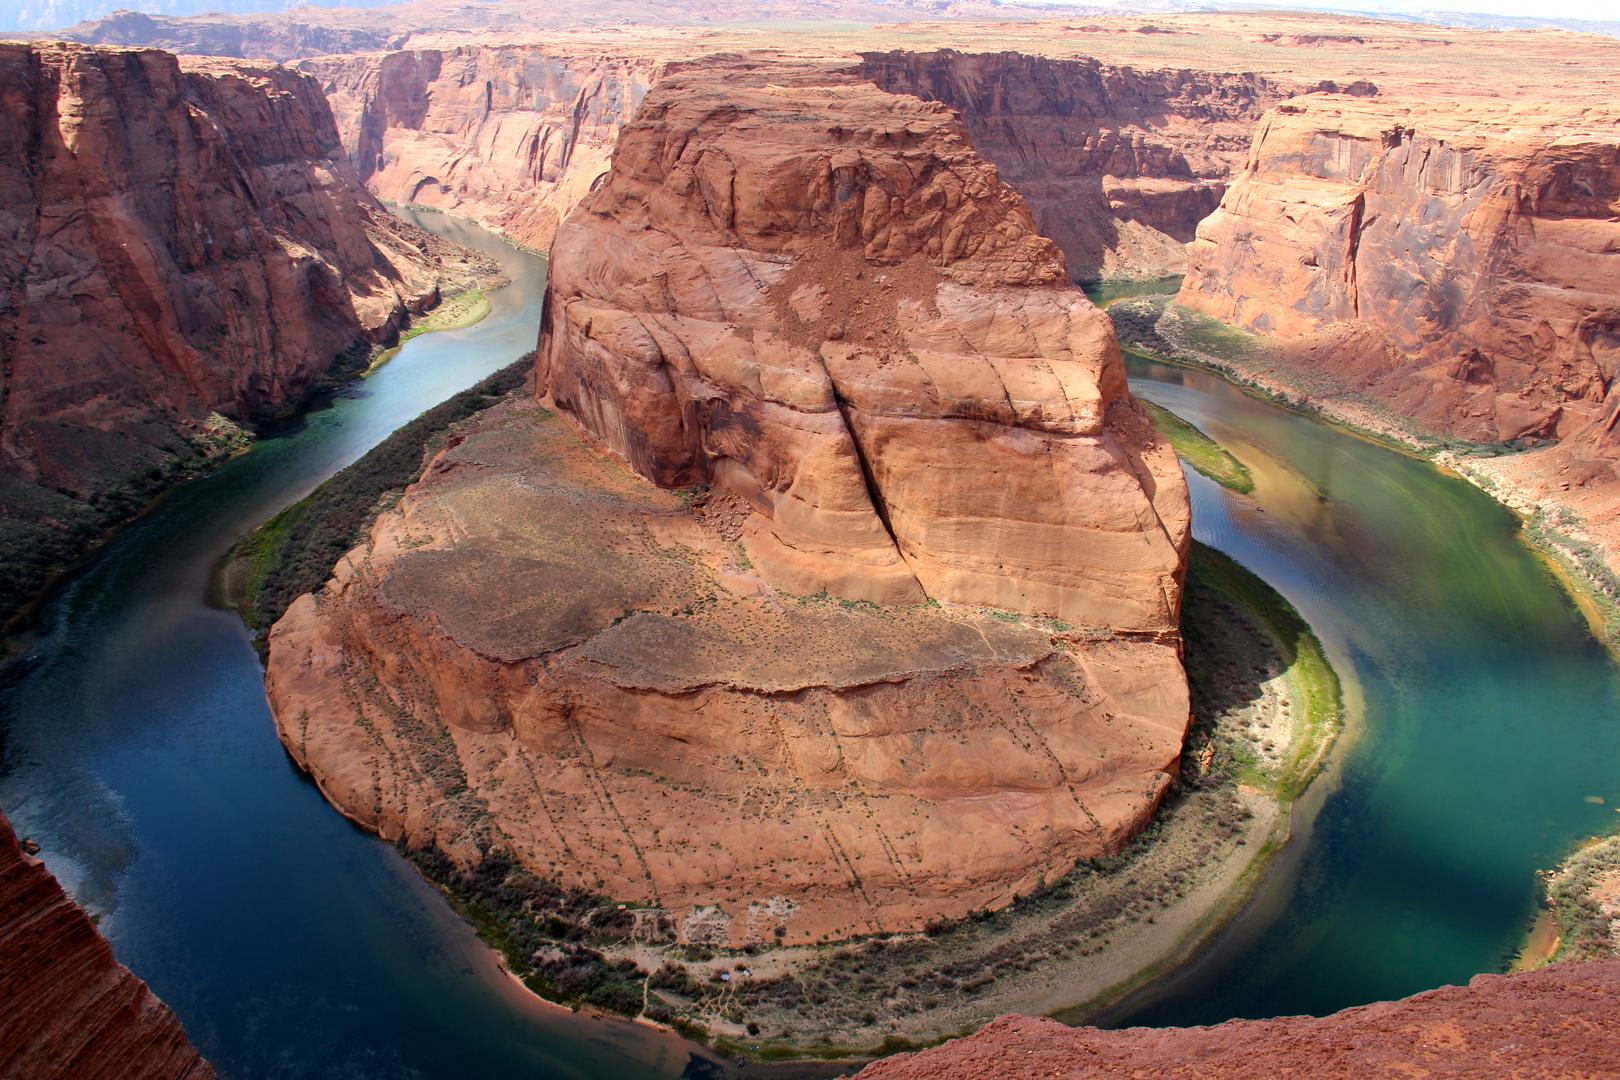 Das Pferd hat den Schuh verloren im Colorado River...